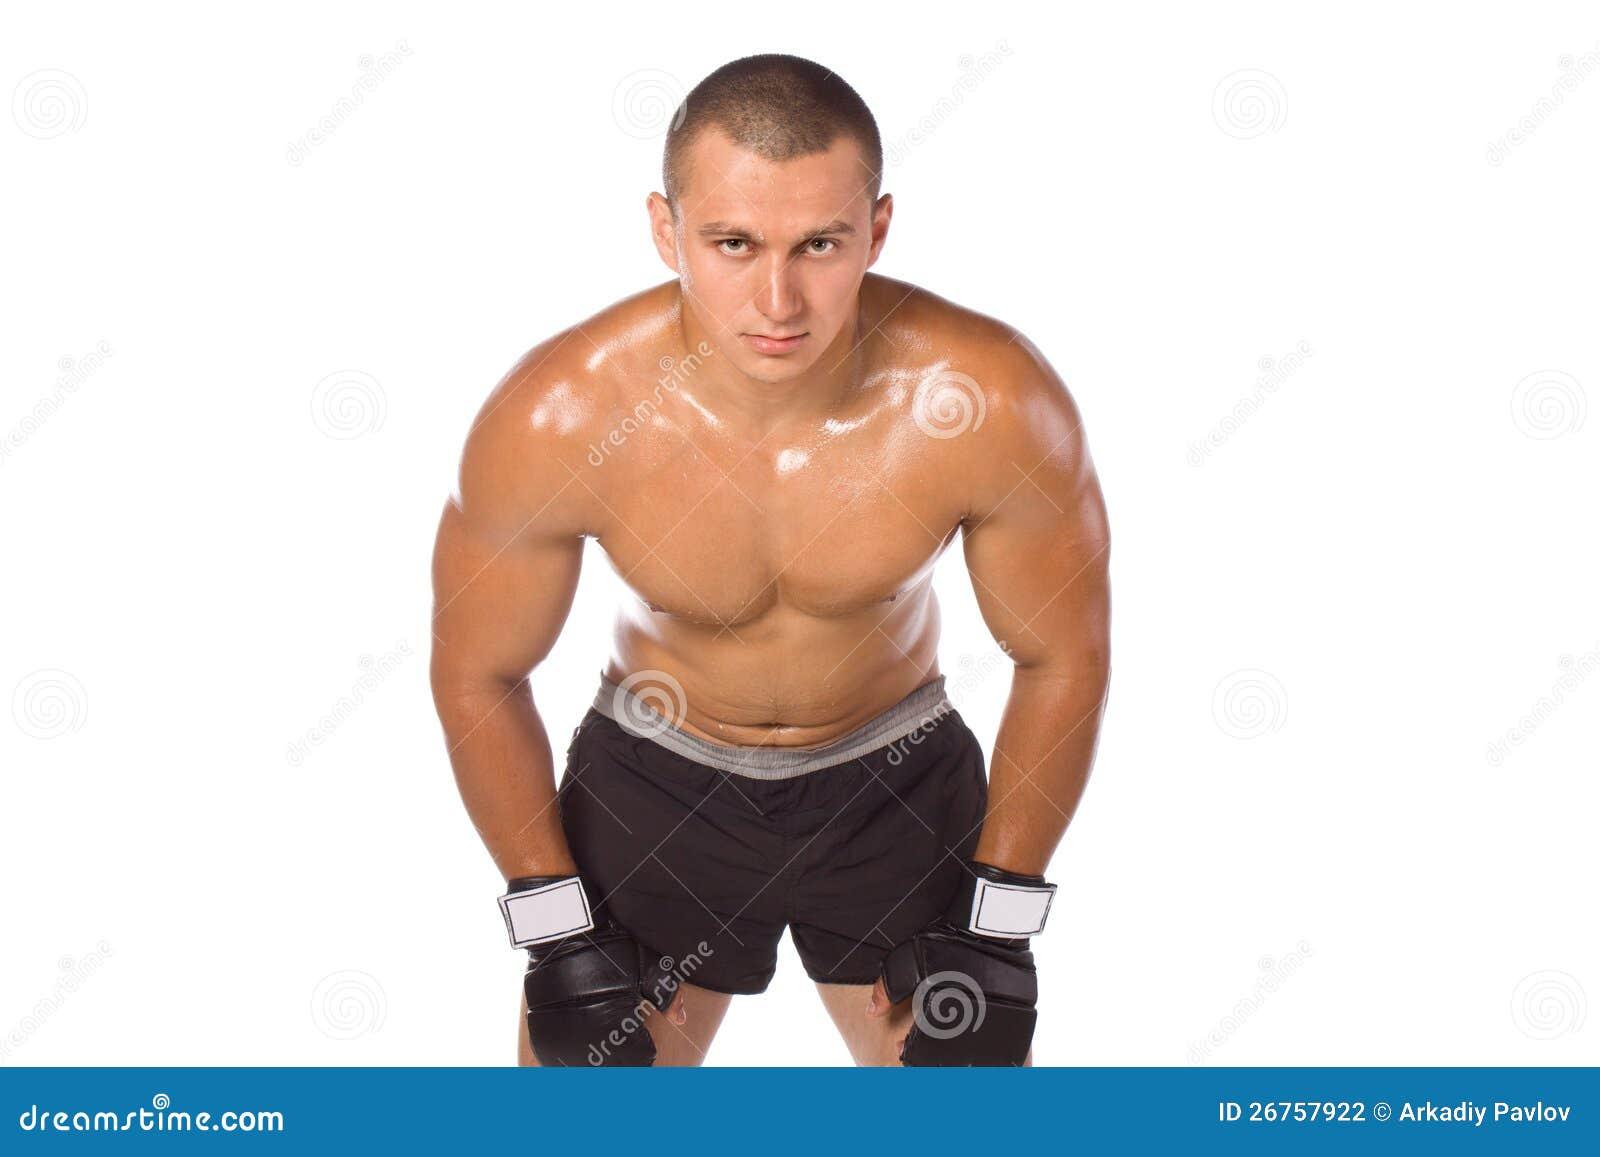 Męski bokser, wojownik. Sporty.